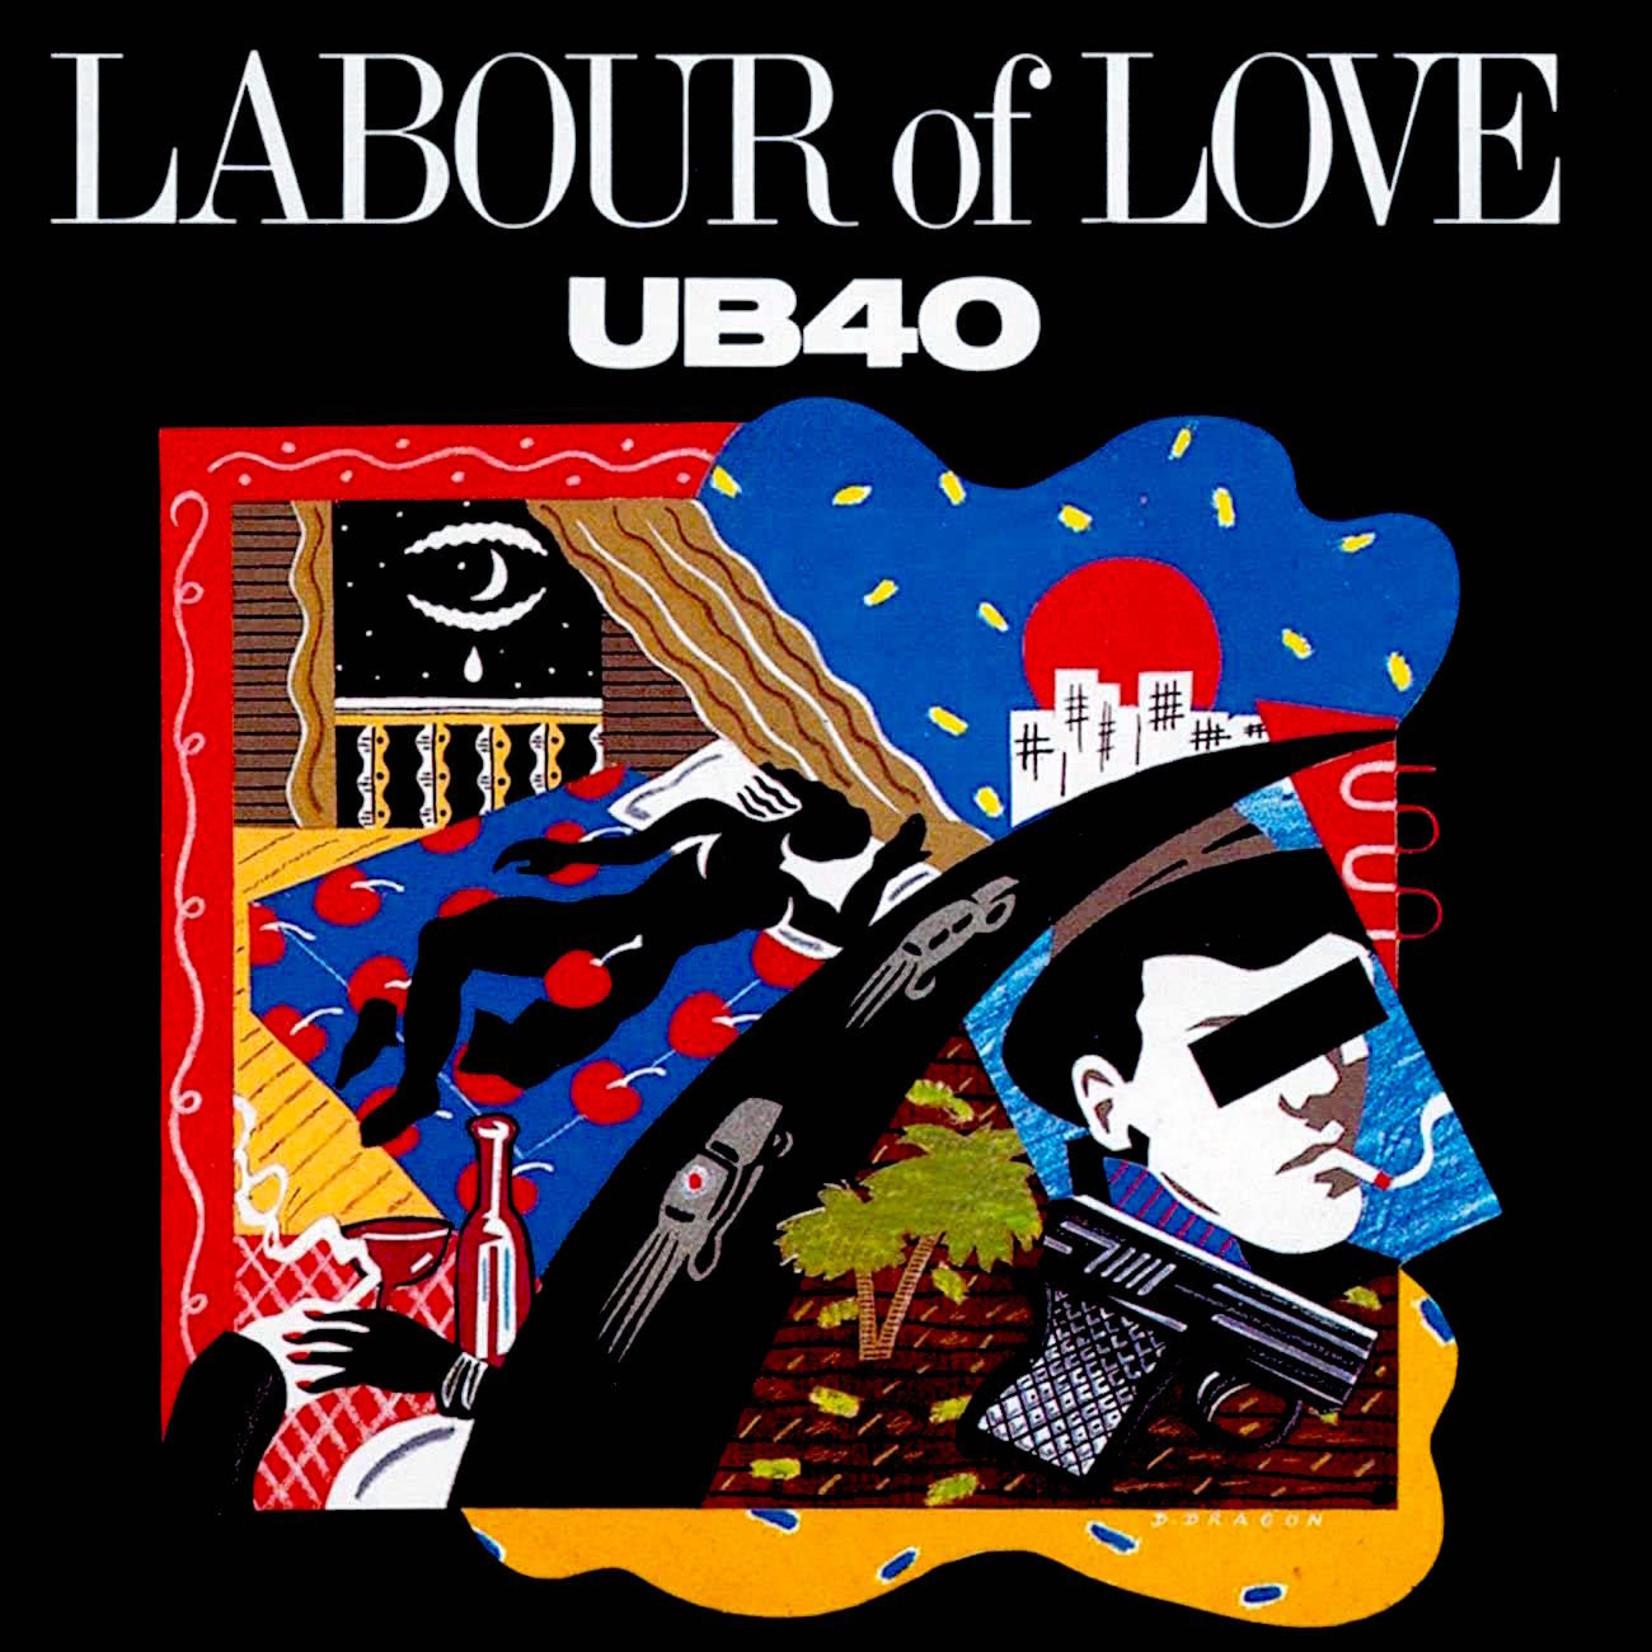 [Vintage] UB40: Labour of Love